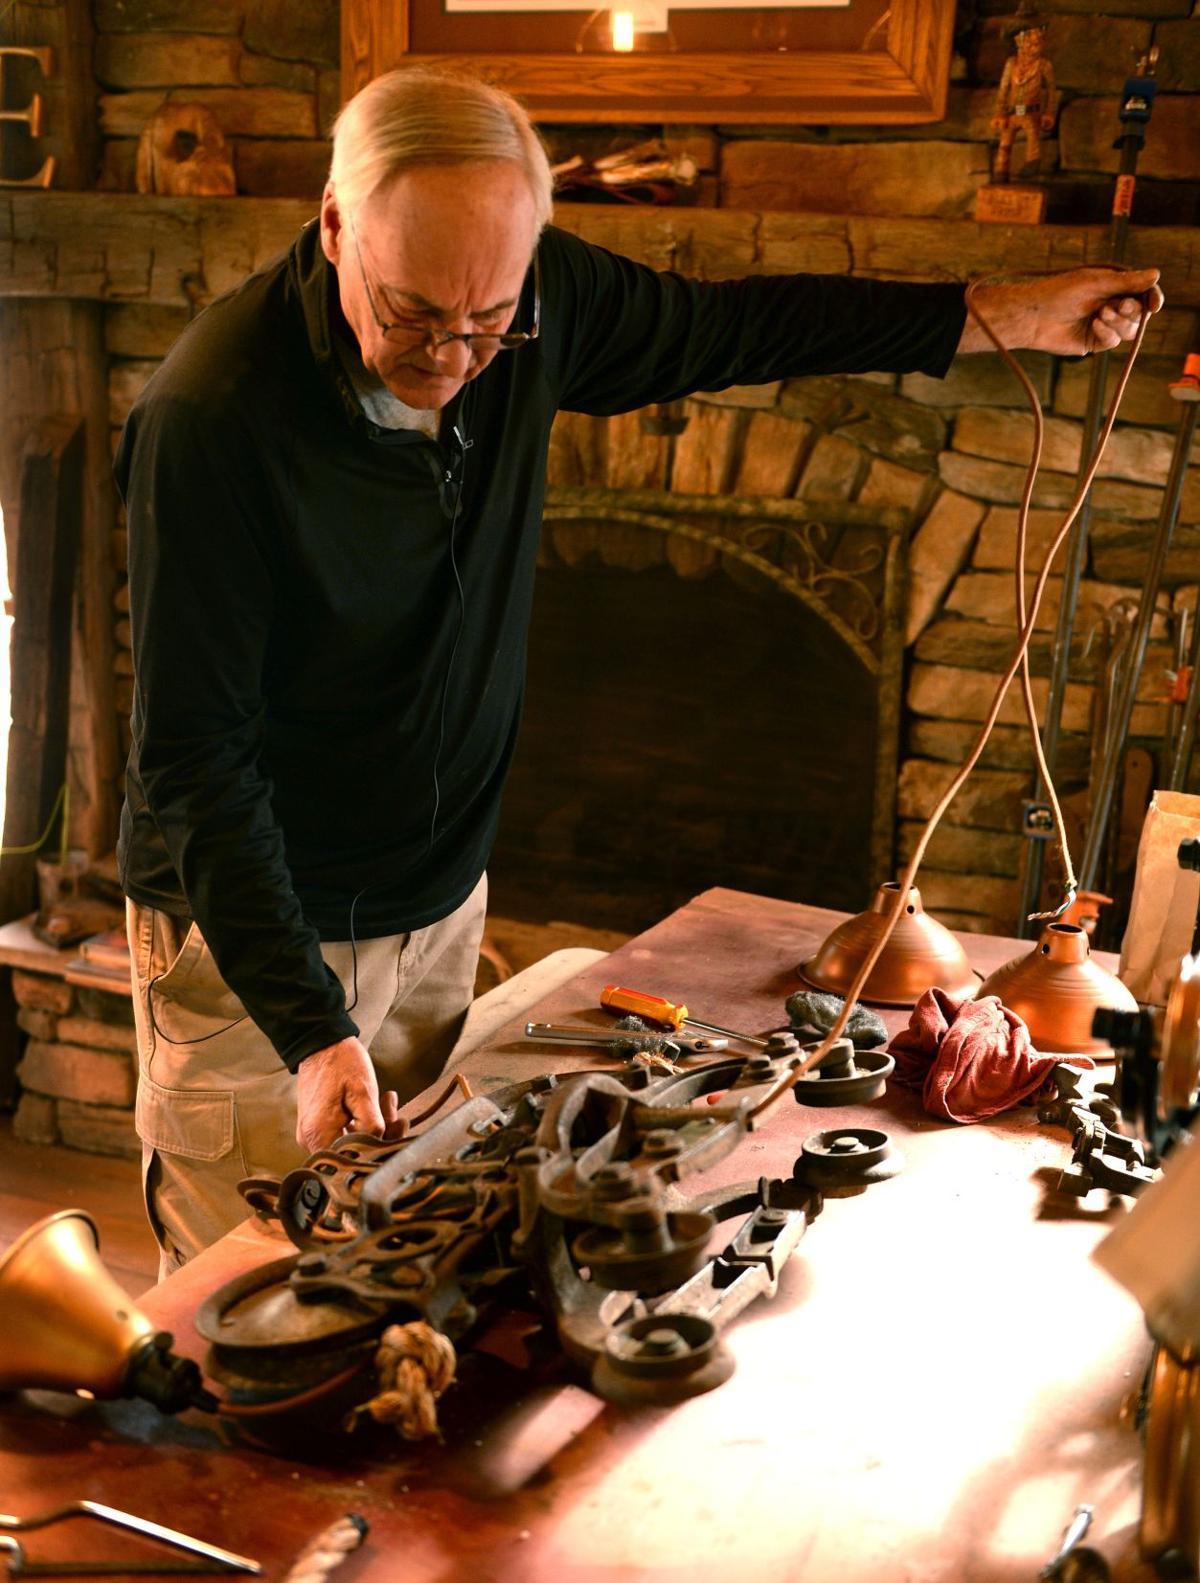 Man turns odd Americana into ornate lighting fixtures | Arts